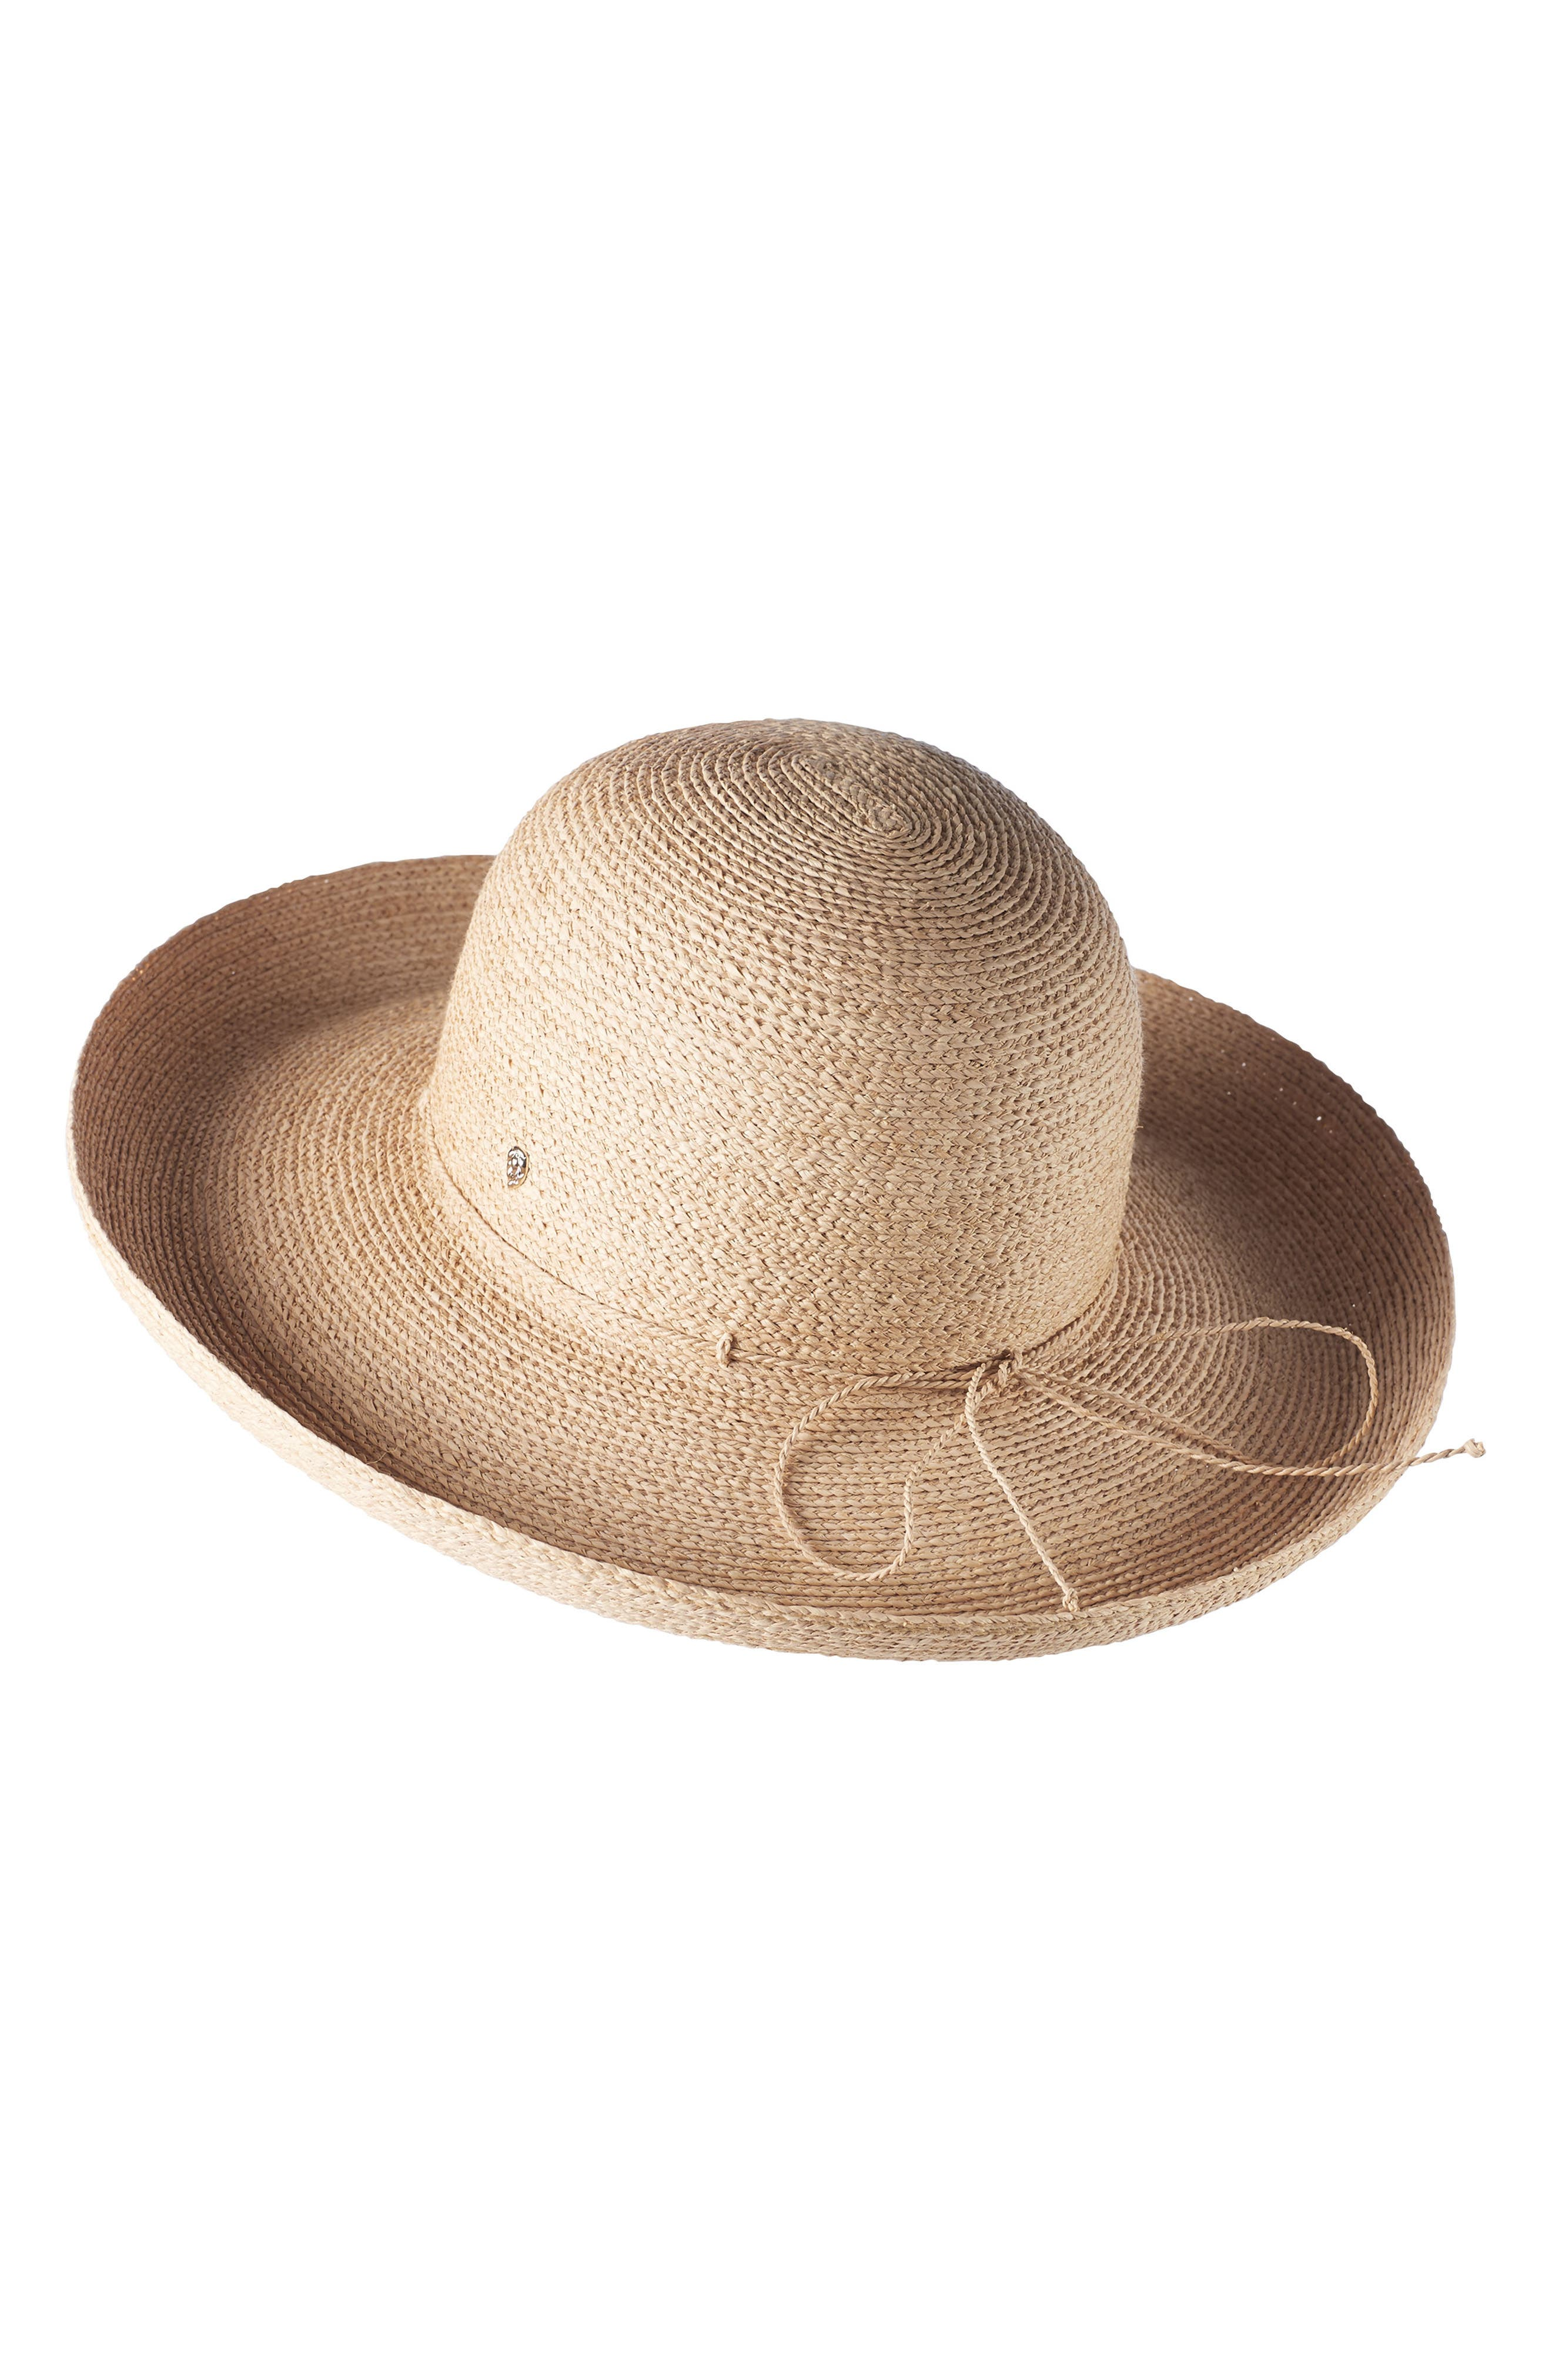 Rolled Brim Raffia Hat,                             Main thumbnail 1, color,                             Natural